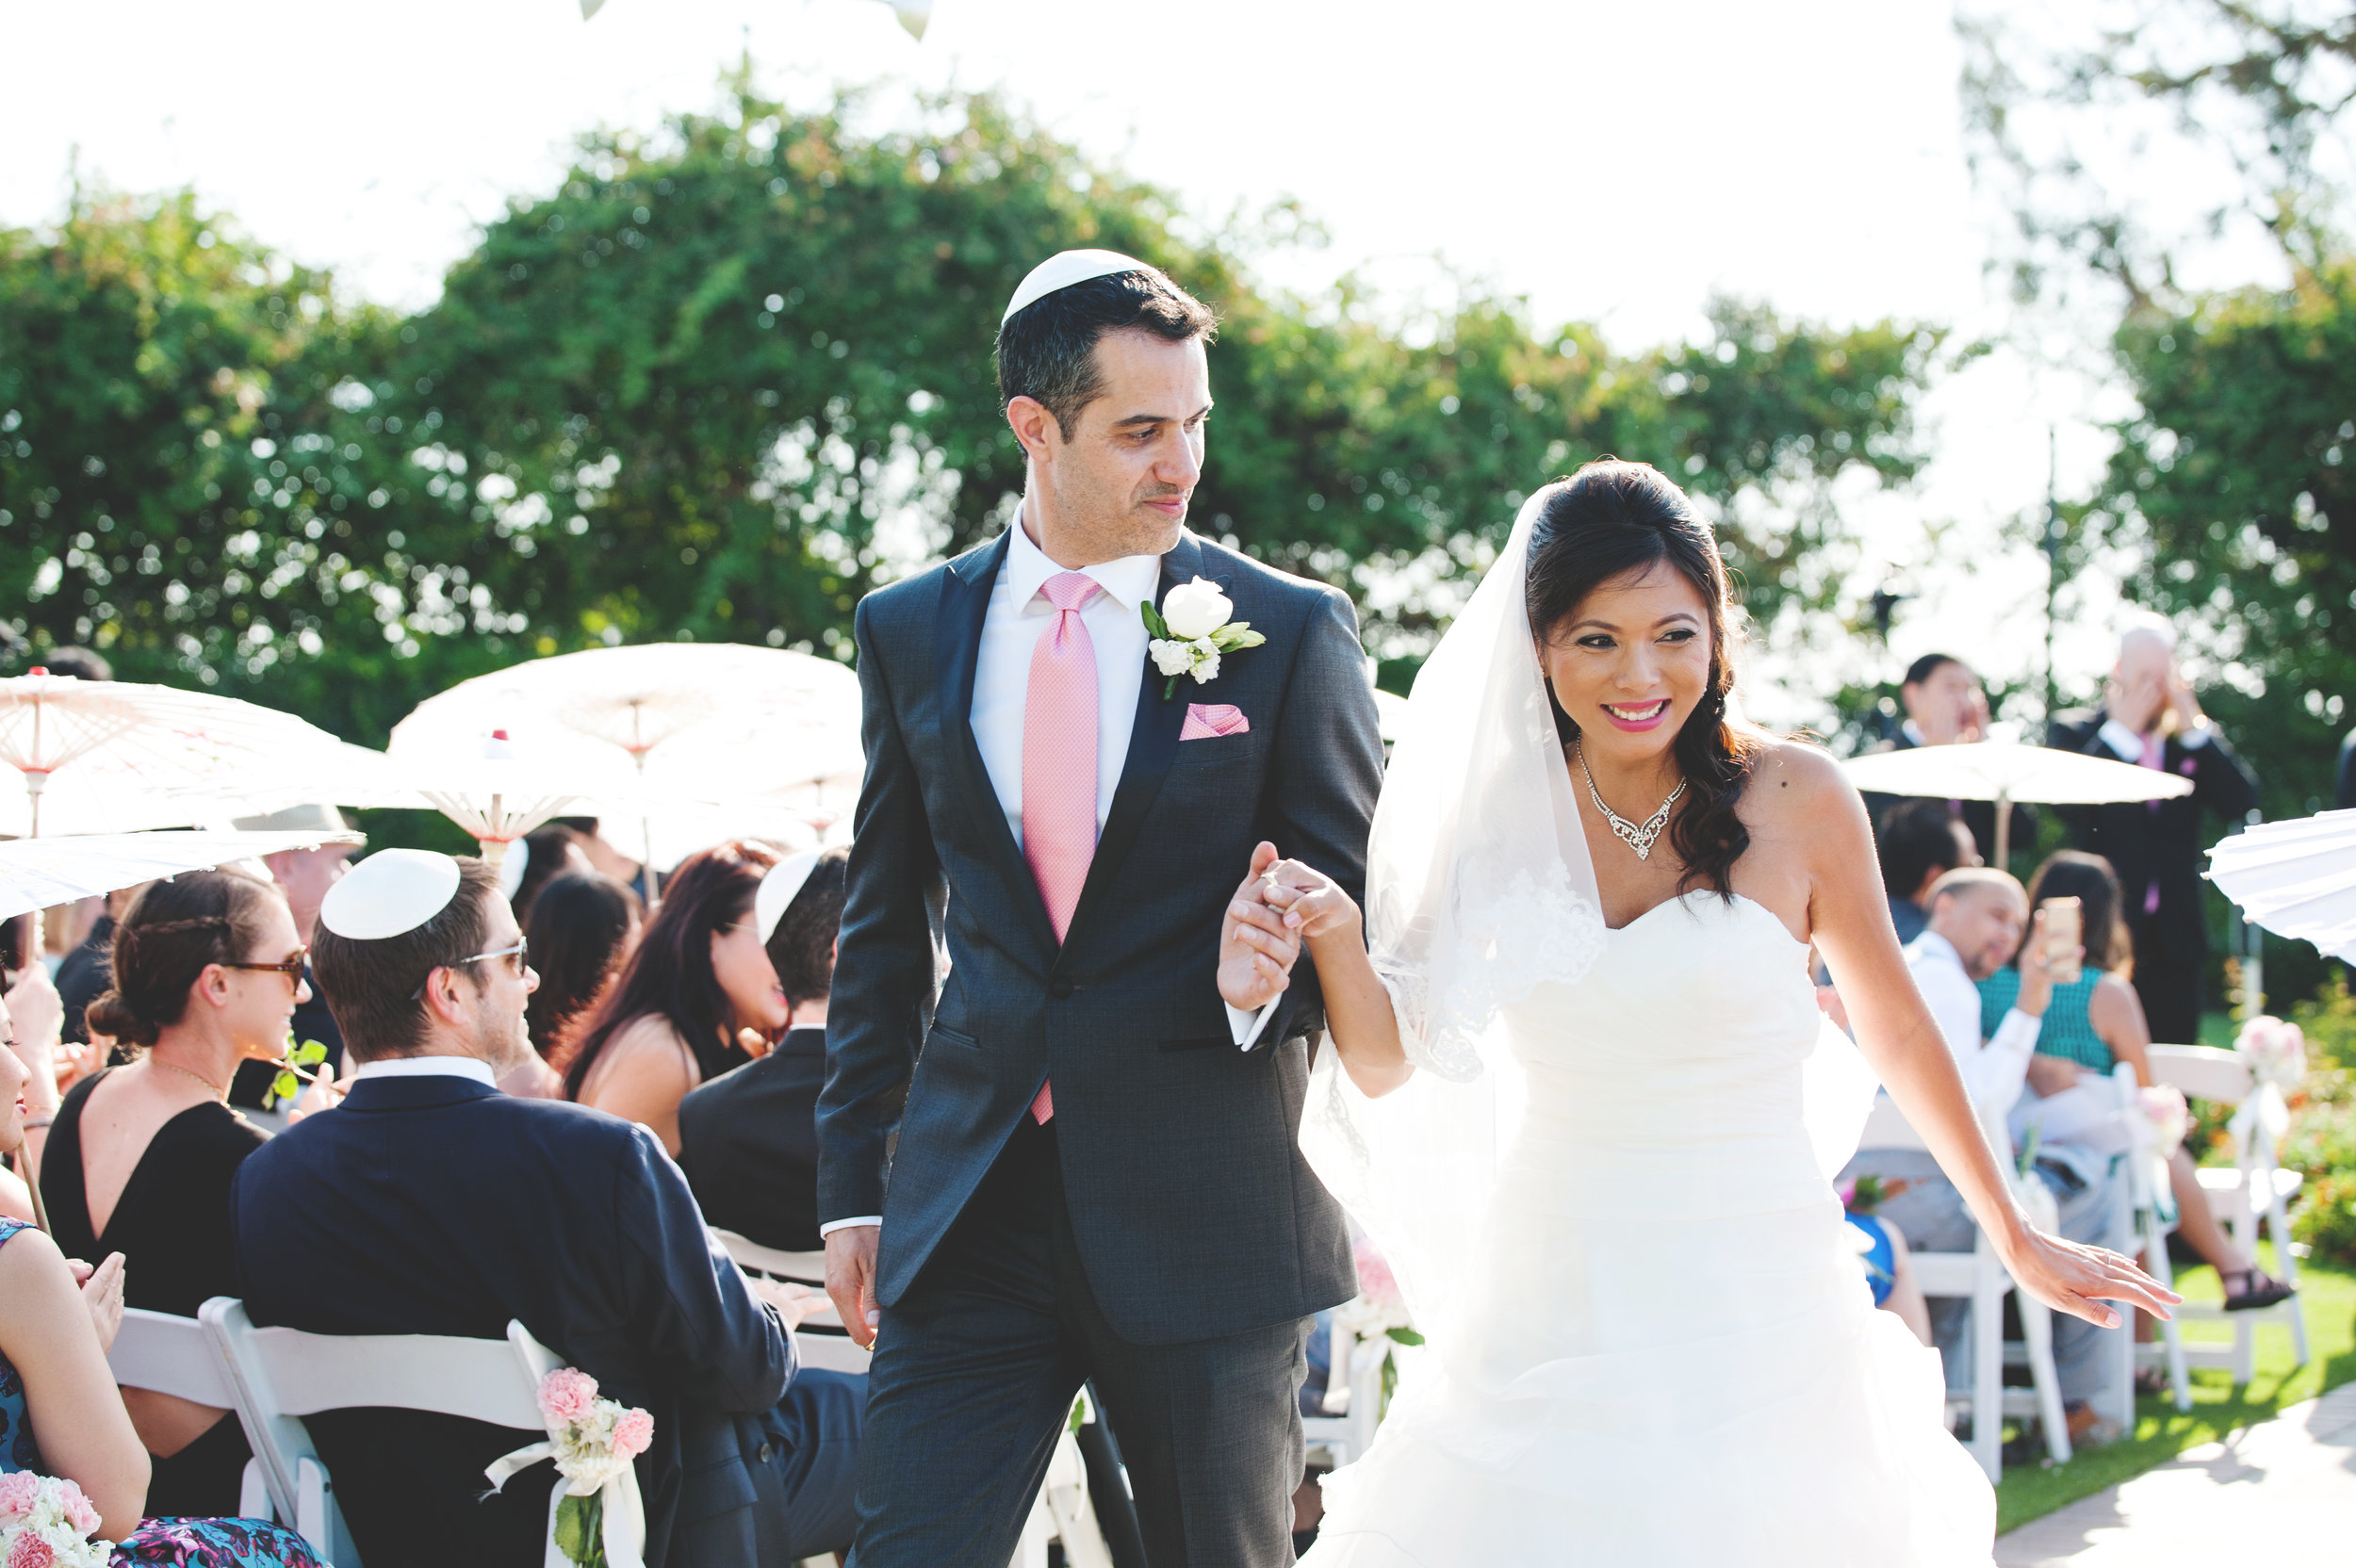 waghalterwedding-1.jpg